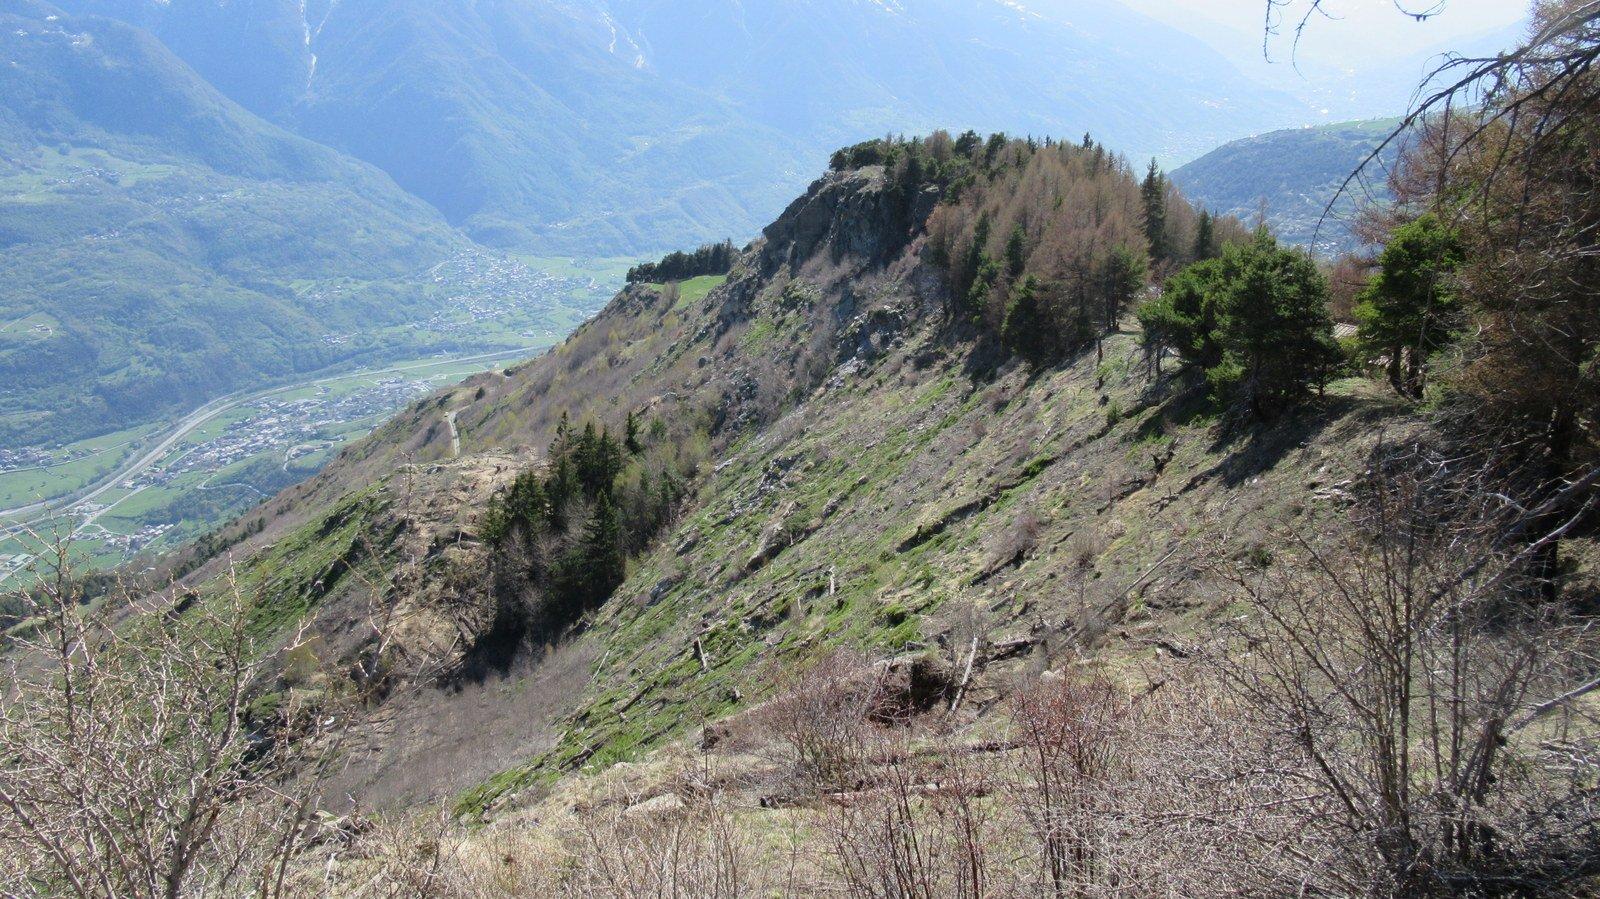 Il Mont de La Pesse visto dall'Alpe La Pesse Dessus